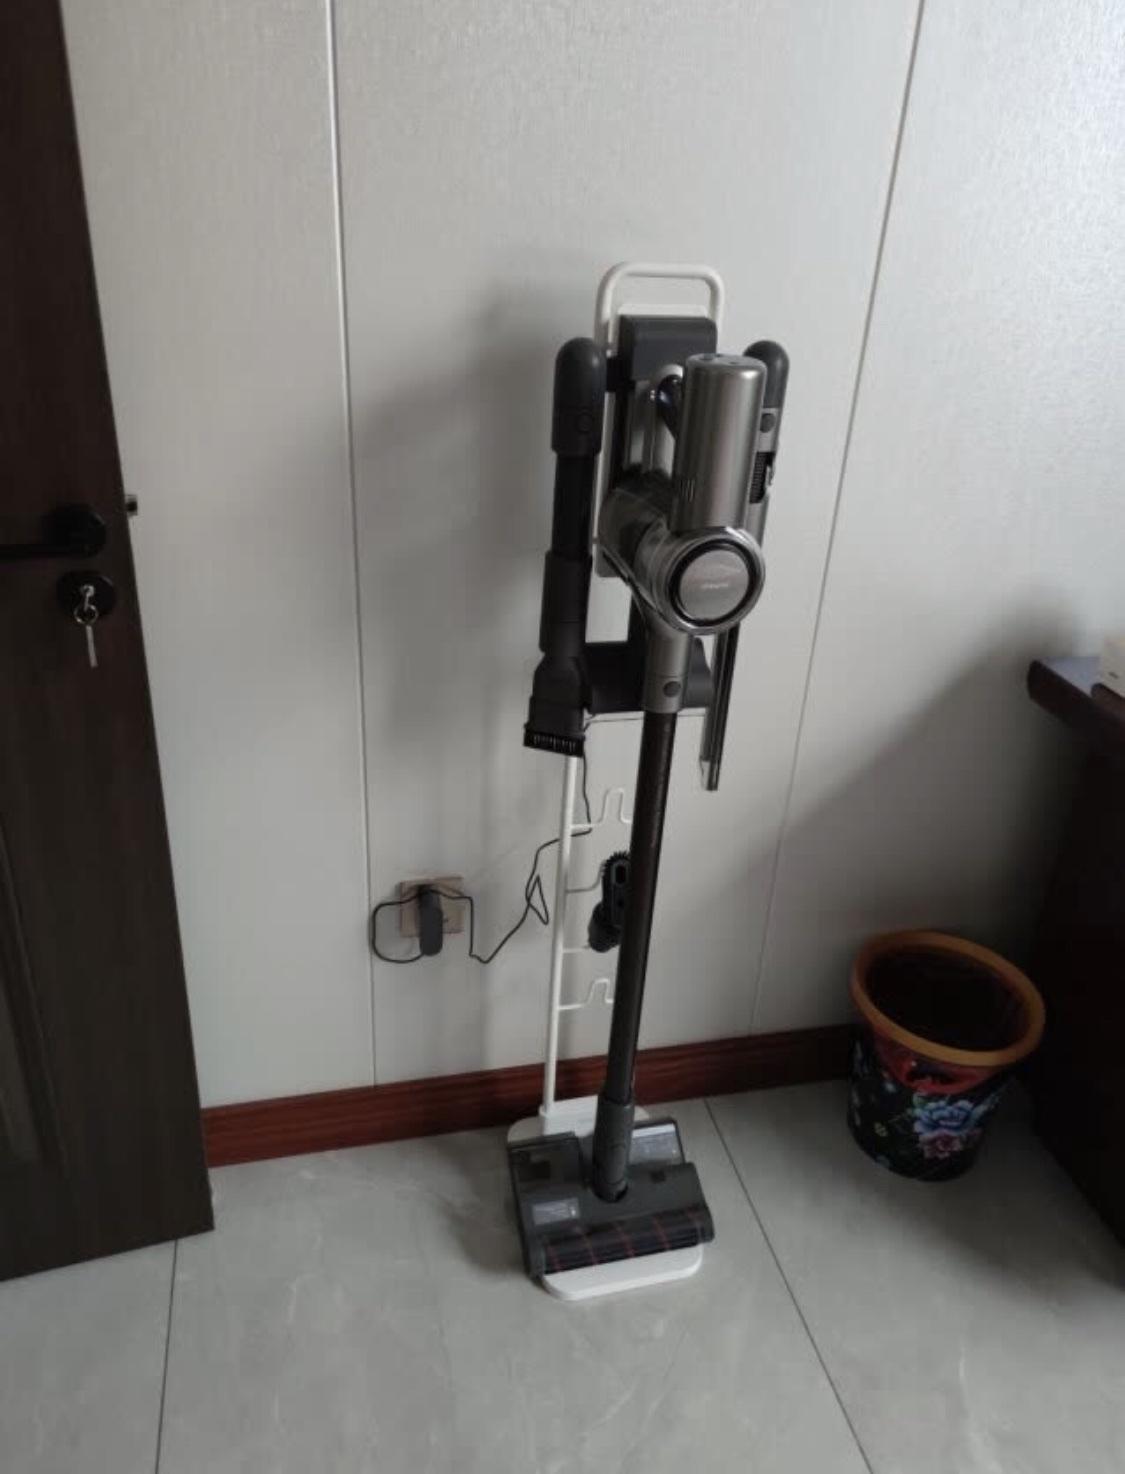 dreame追觅V12手持无线吸尘器家用小型大吸力除螨